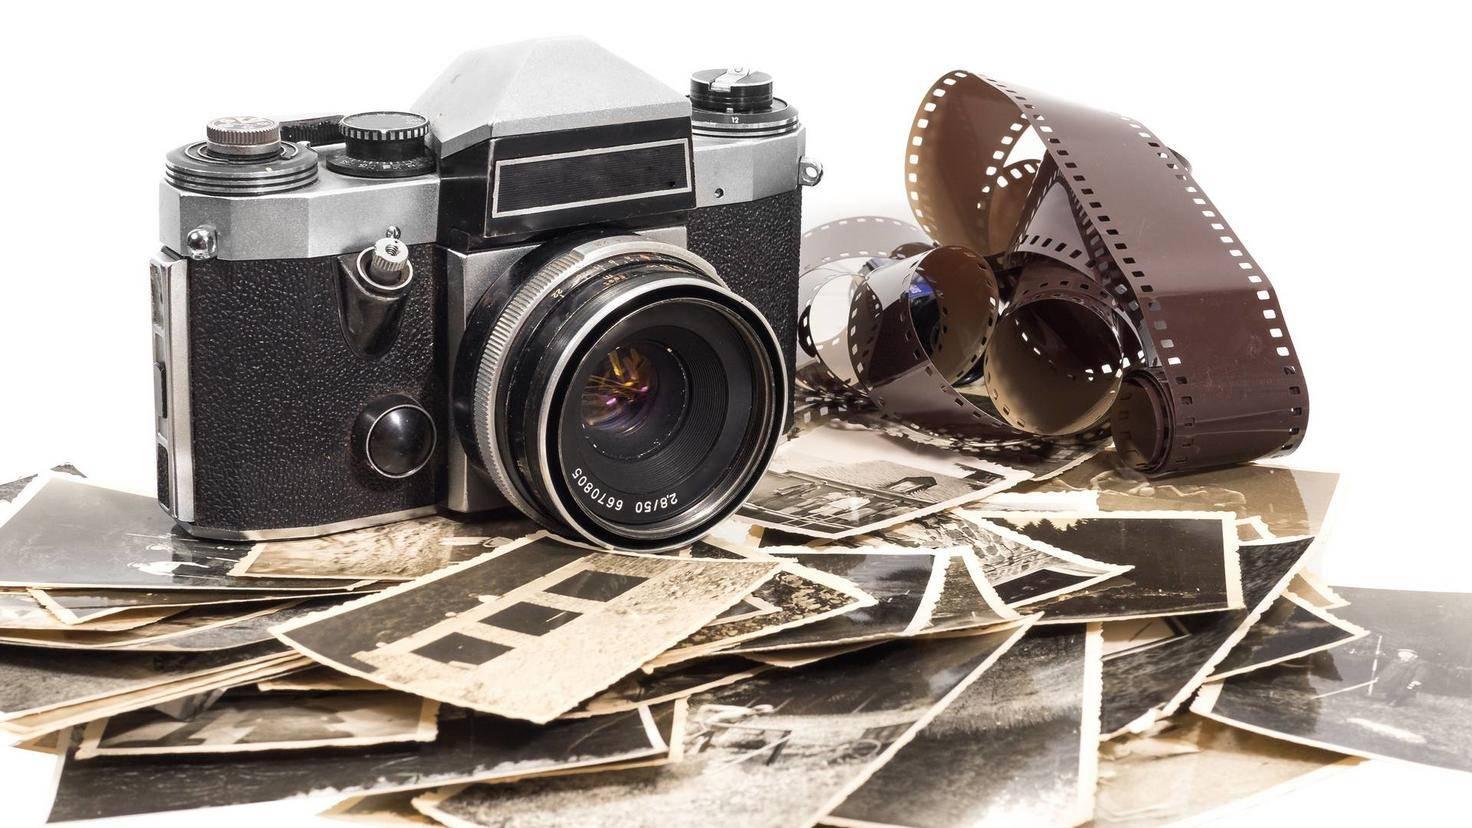 alter antiker fotoapparat mit fotografien